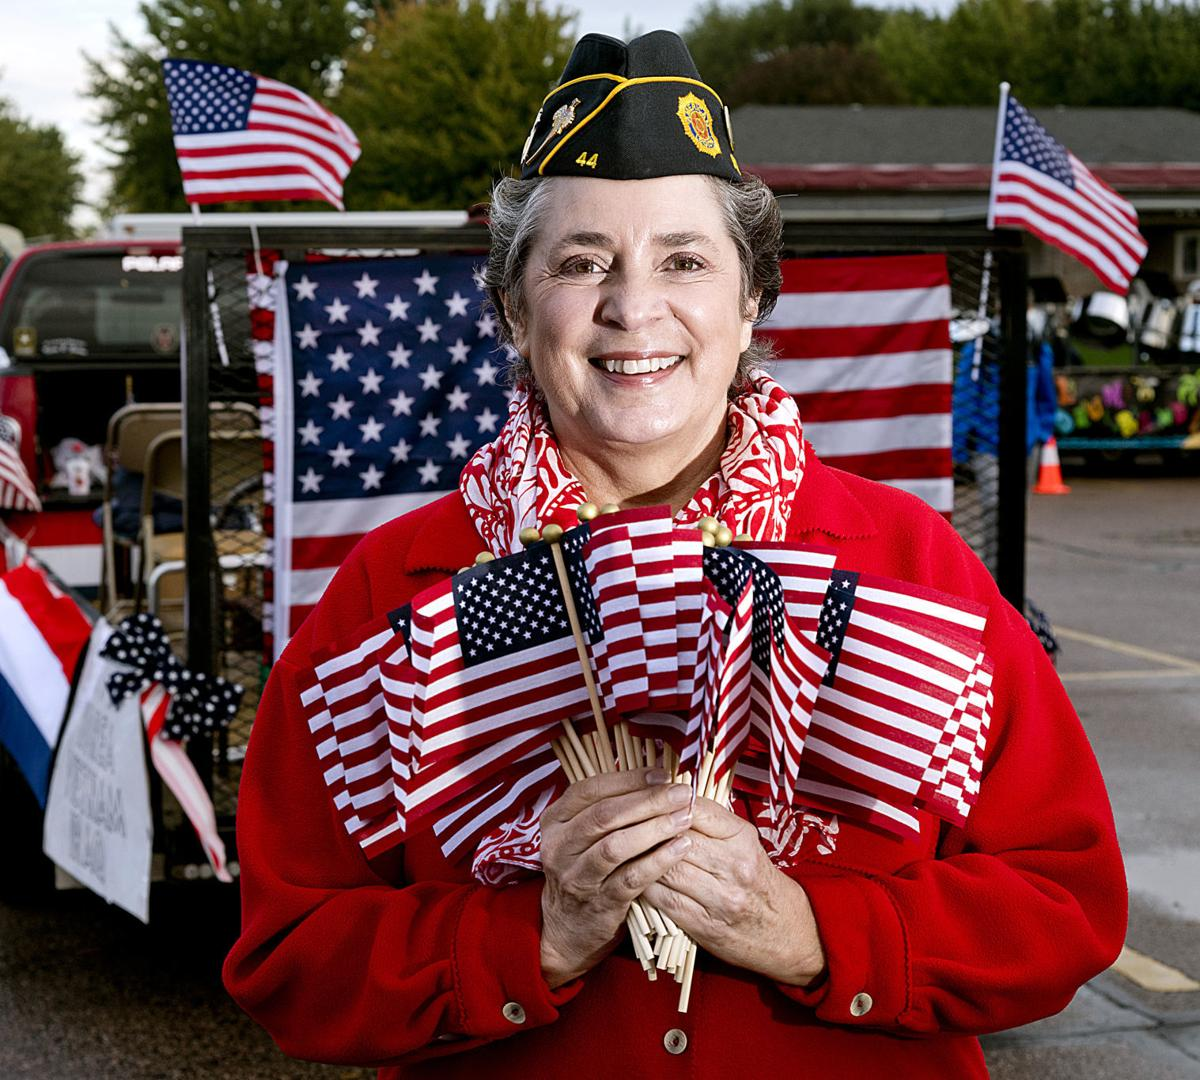 Female veteran Cynthia Aden